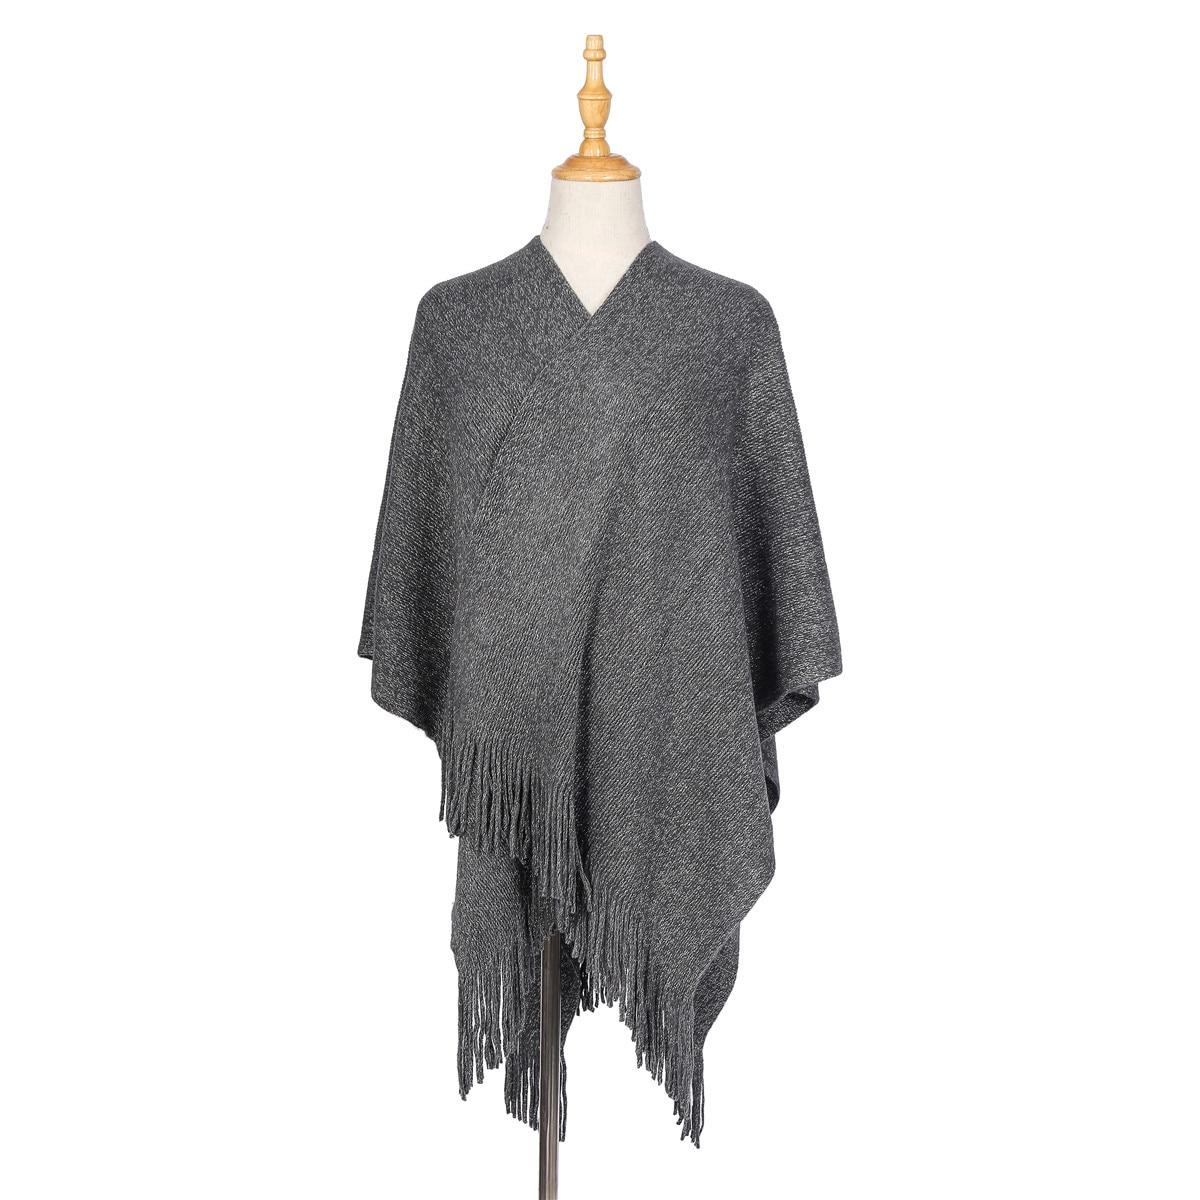 New Women Ladies Soft Wooly Blanket Cape Shawl Poncho Scarf Wrap Tassel Fringe